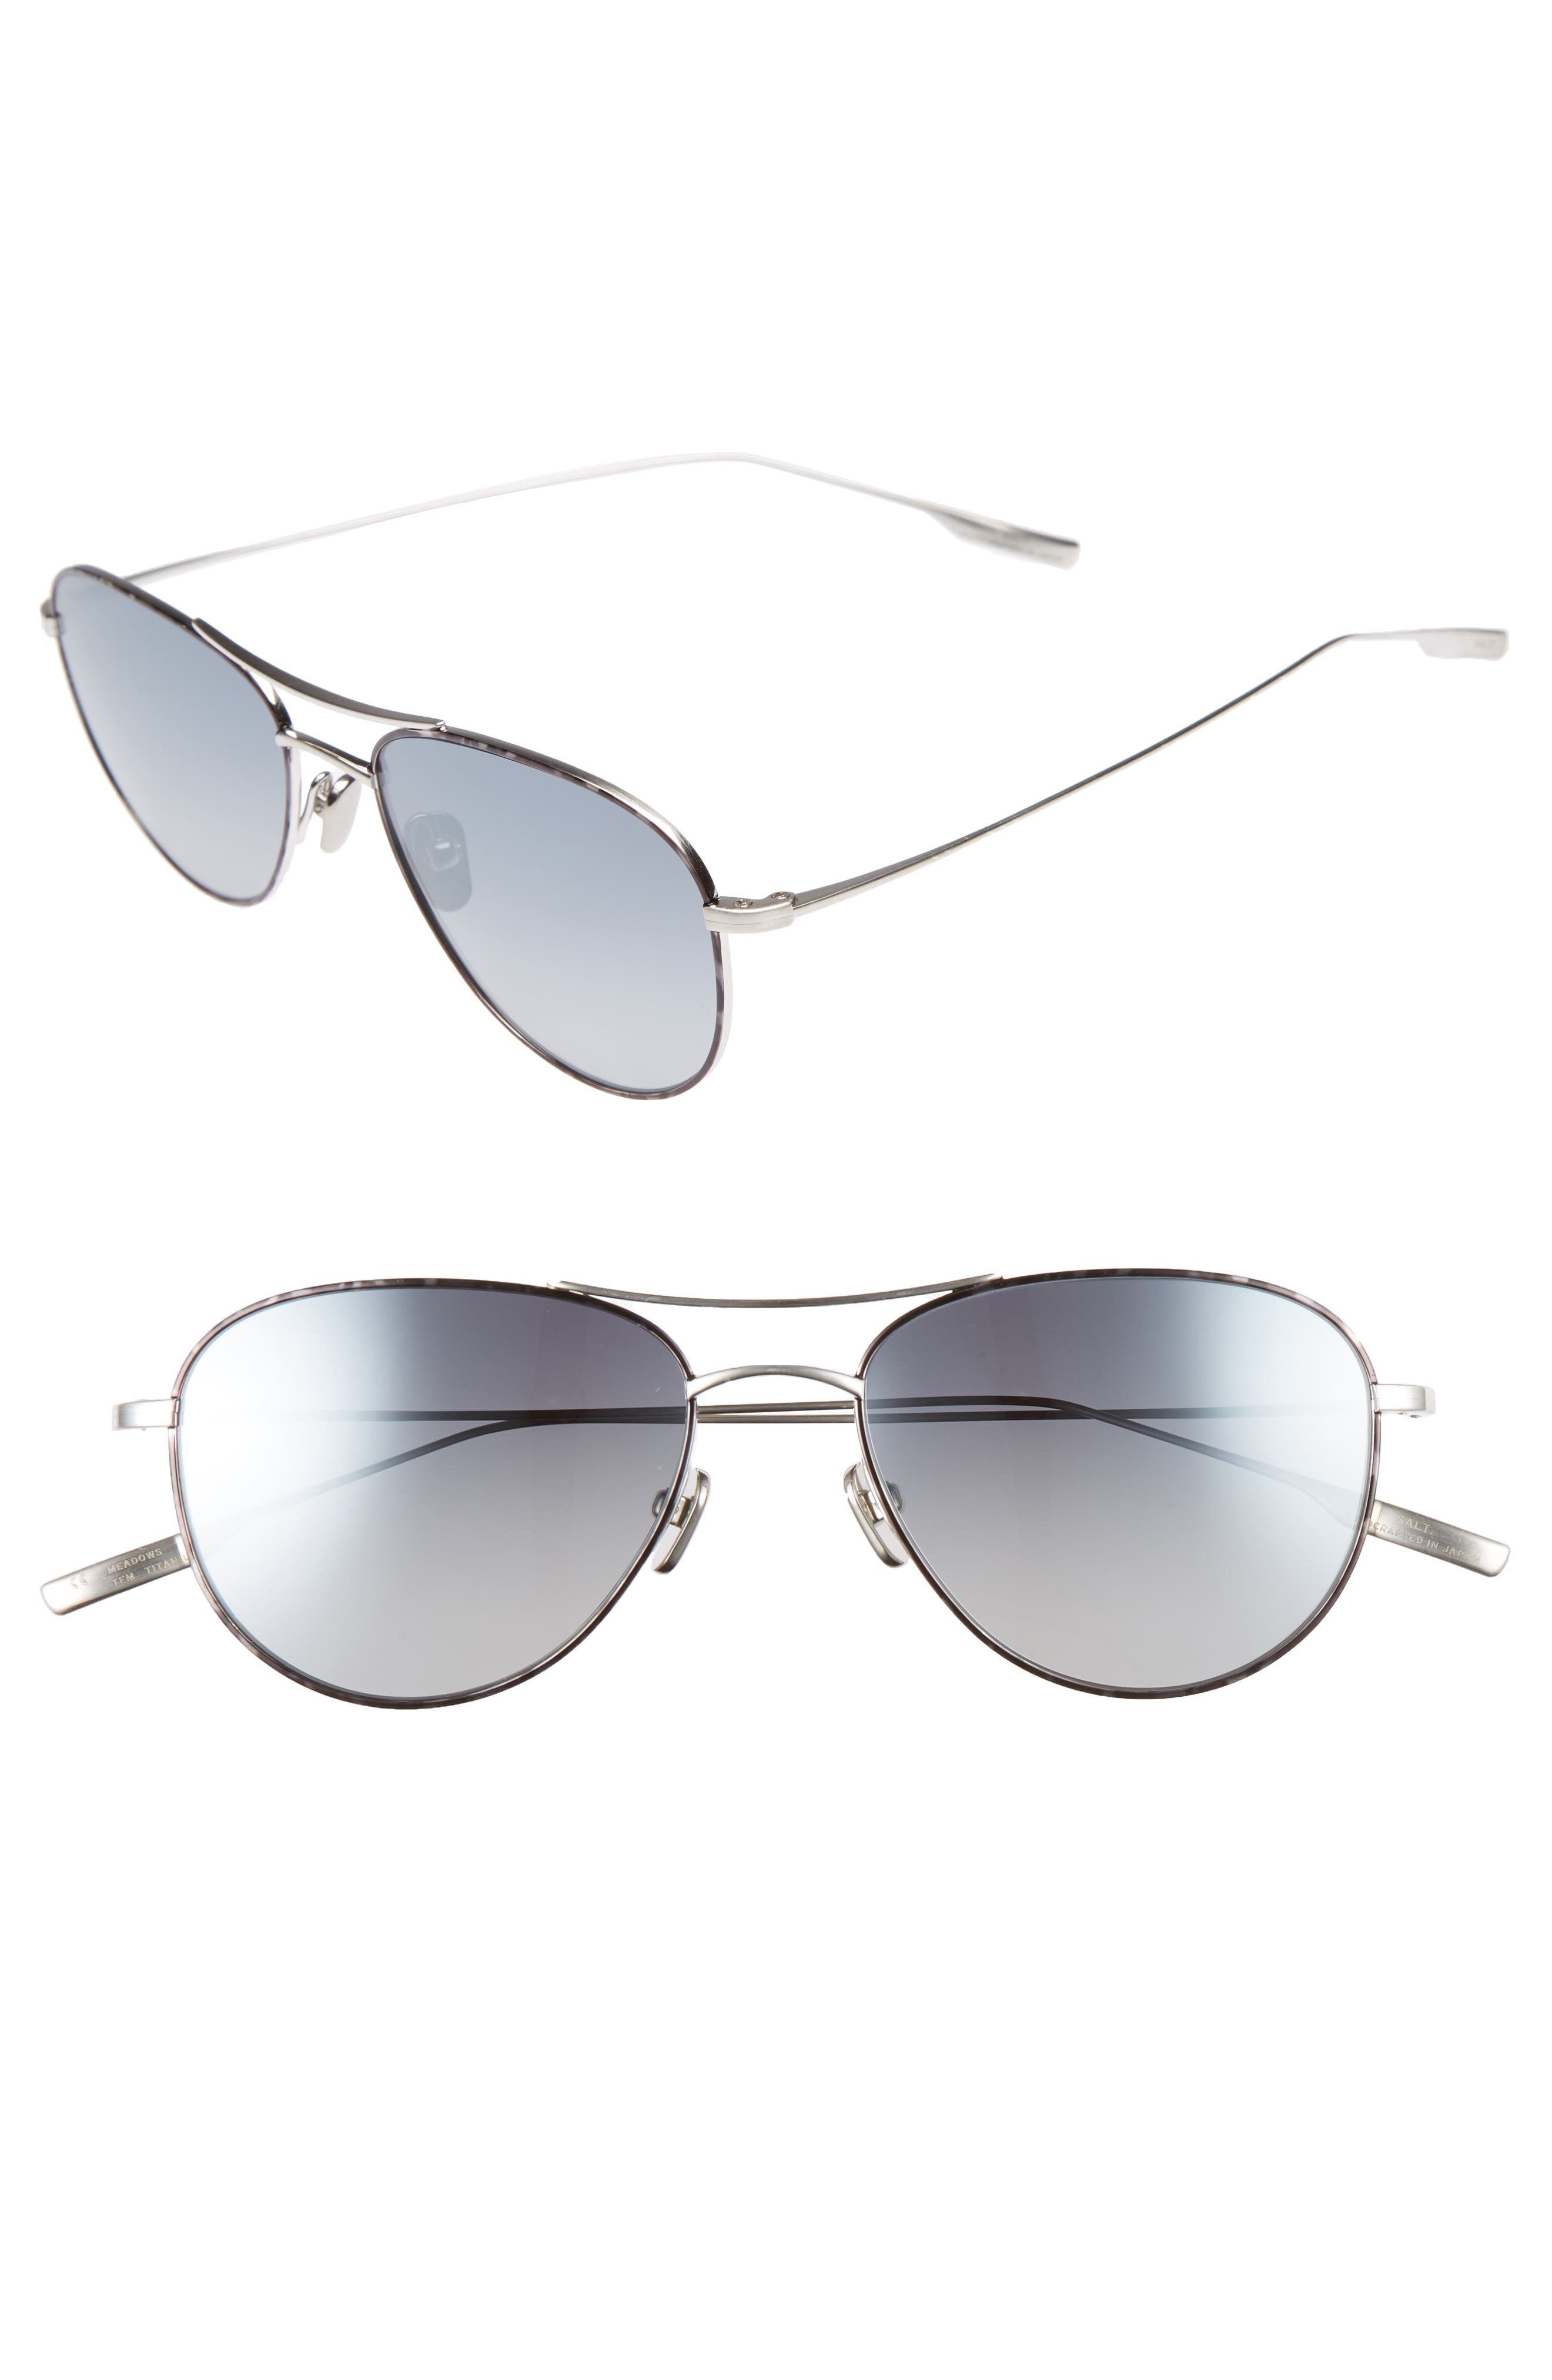 'Meadows' 54mm Polarized Aviator Sunglasses,                             Main thumbnail 1, color,                             TEMPEST